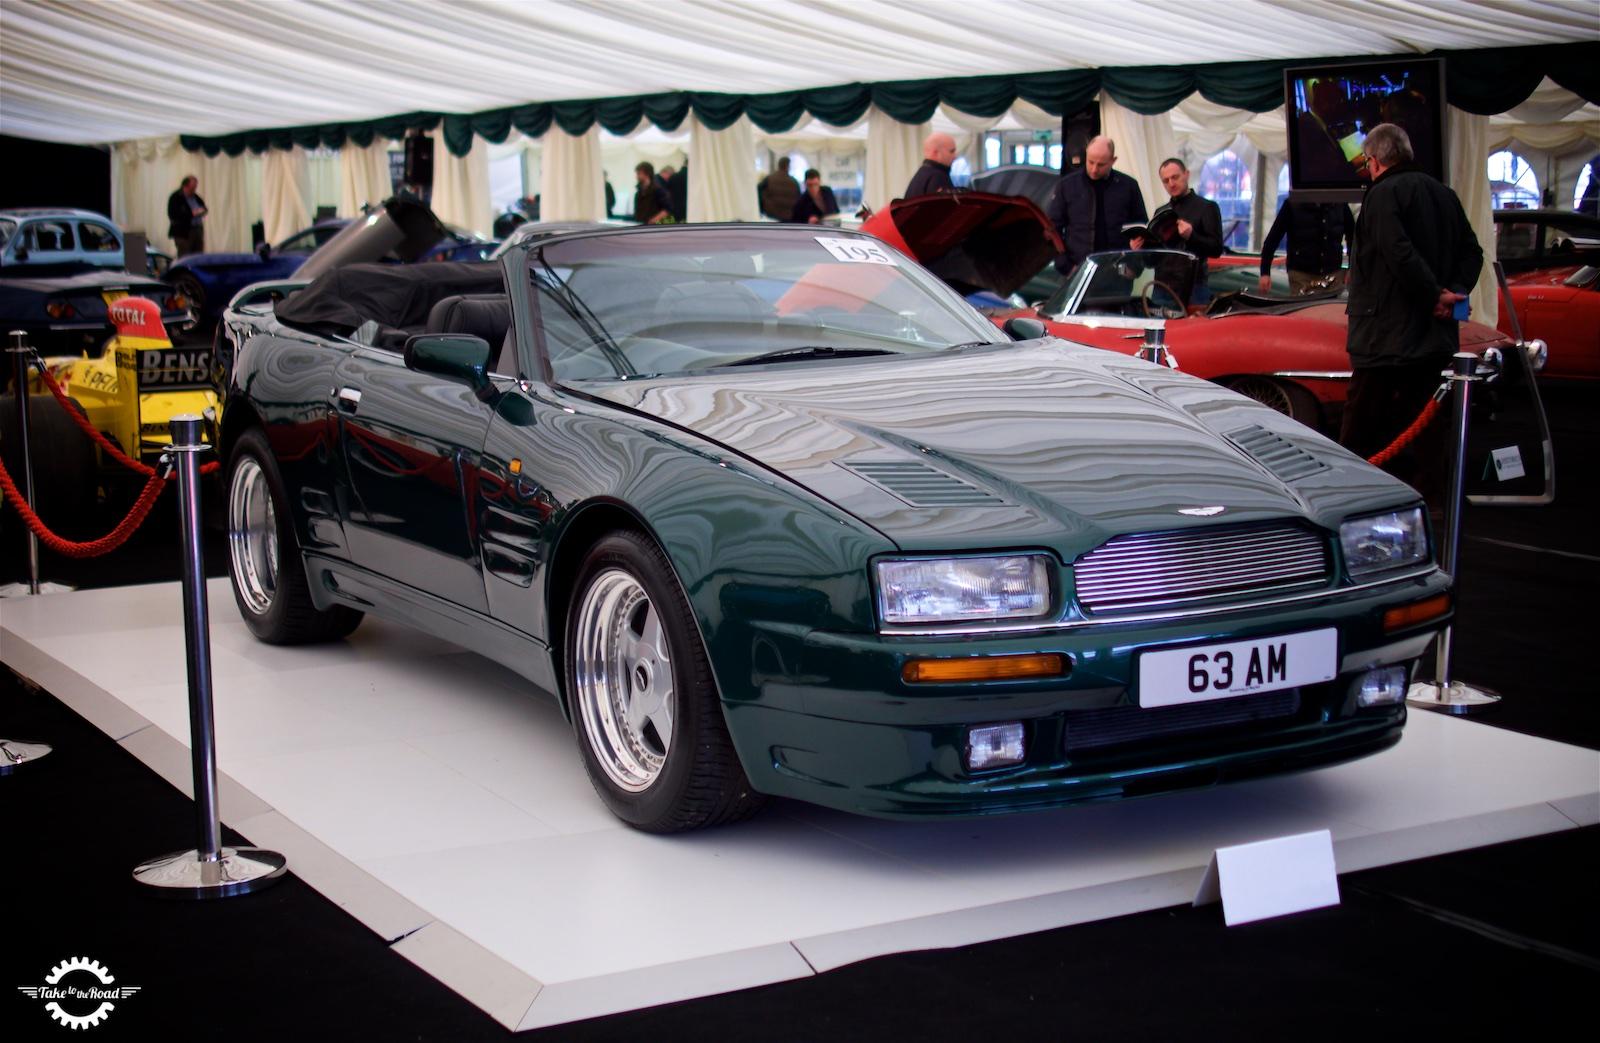 Concours of Elegance to Celebrate Aston Martin and Zagato